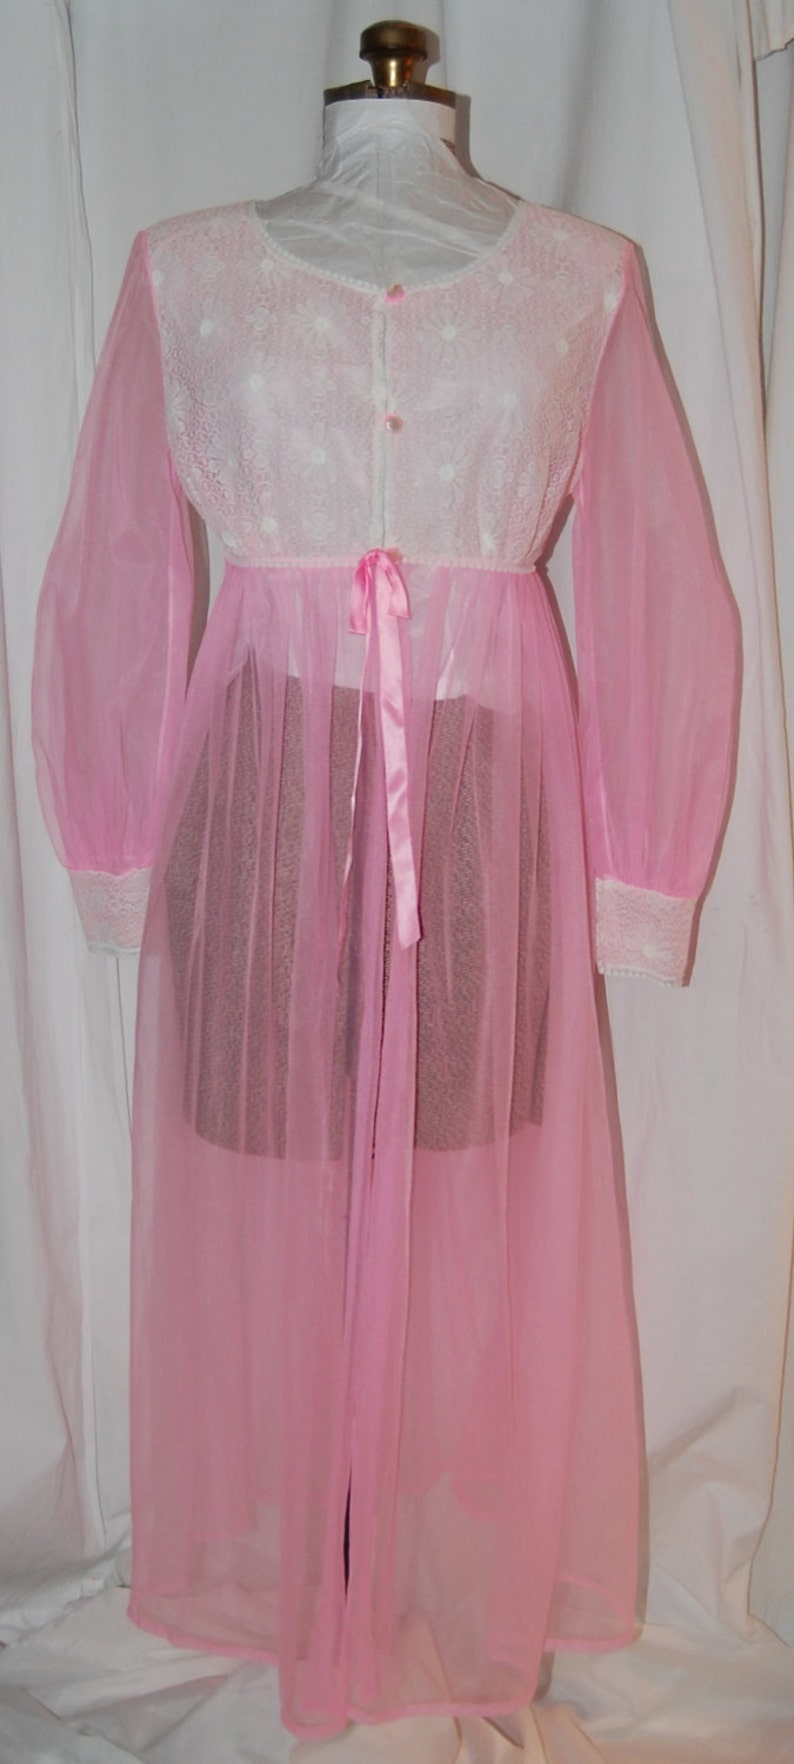 5b03e8887 Vintage sheer robe 70s robe hot pink robe vintage dressing